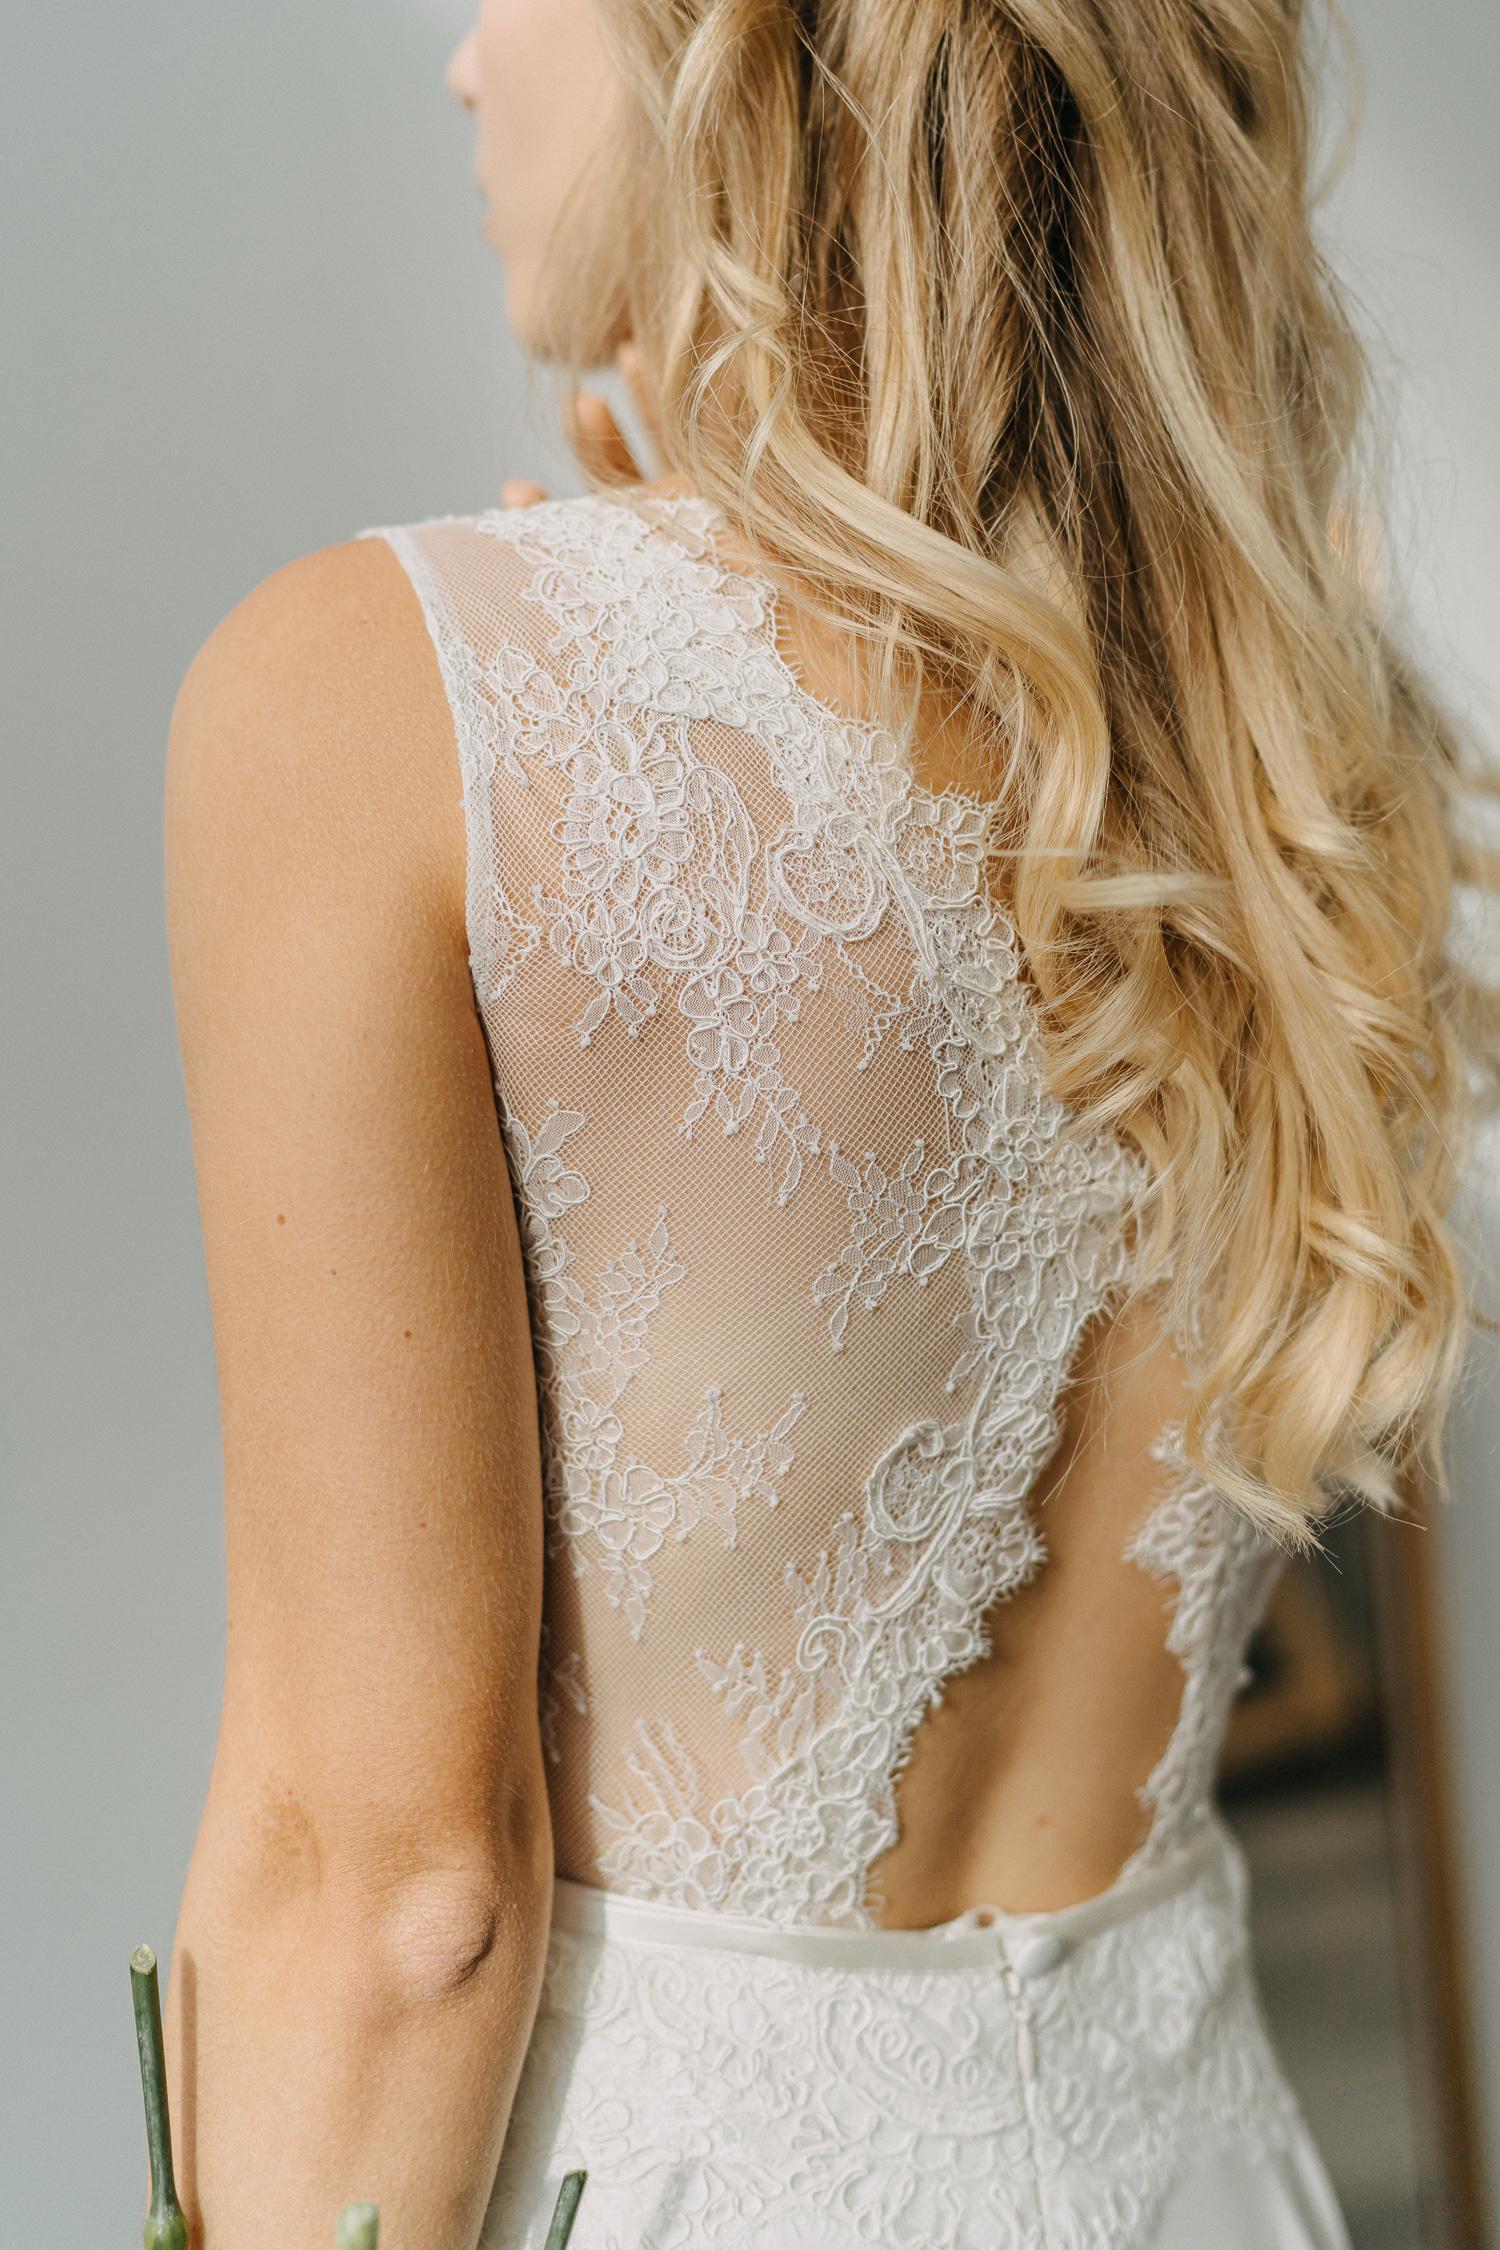 2021 Claudia Heller Brautmode Brautkleid Lilli 4 – gesehen bei frauimmer-herrewig.de